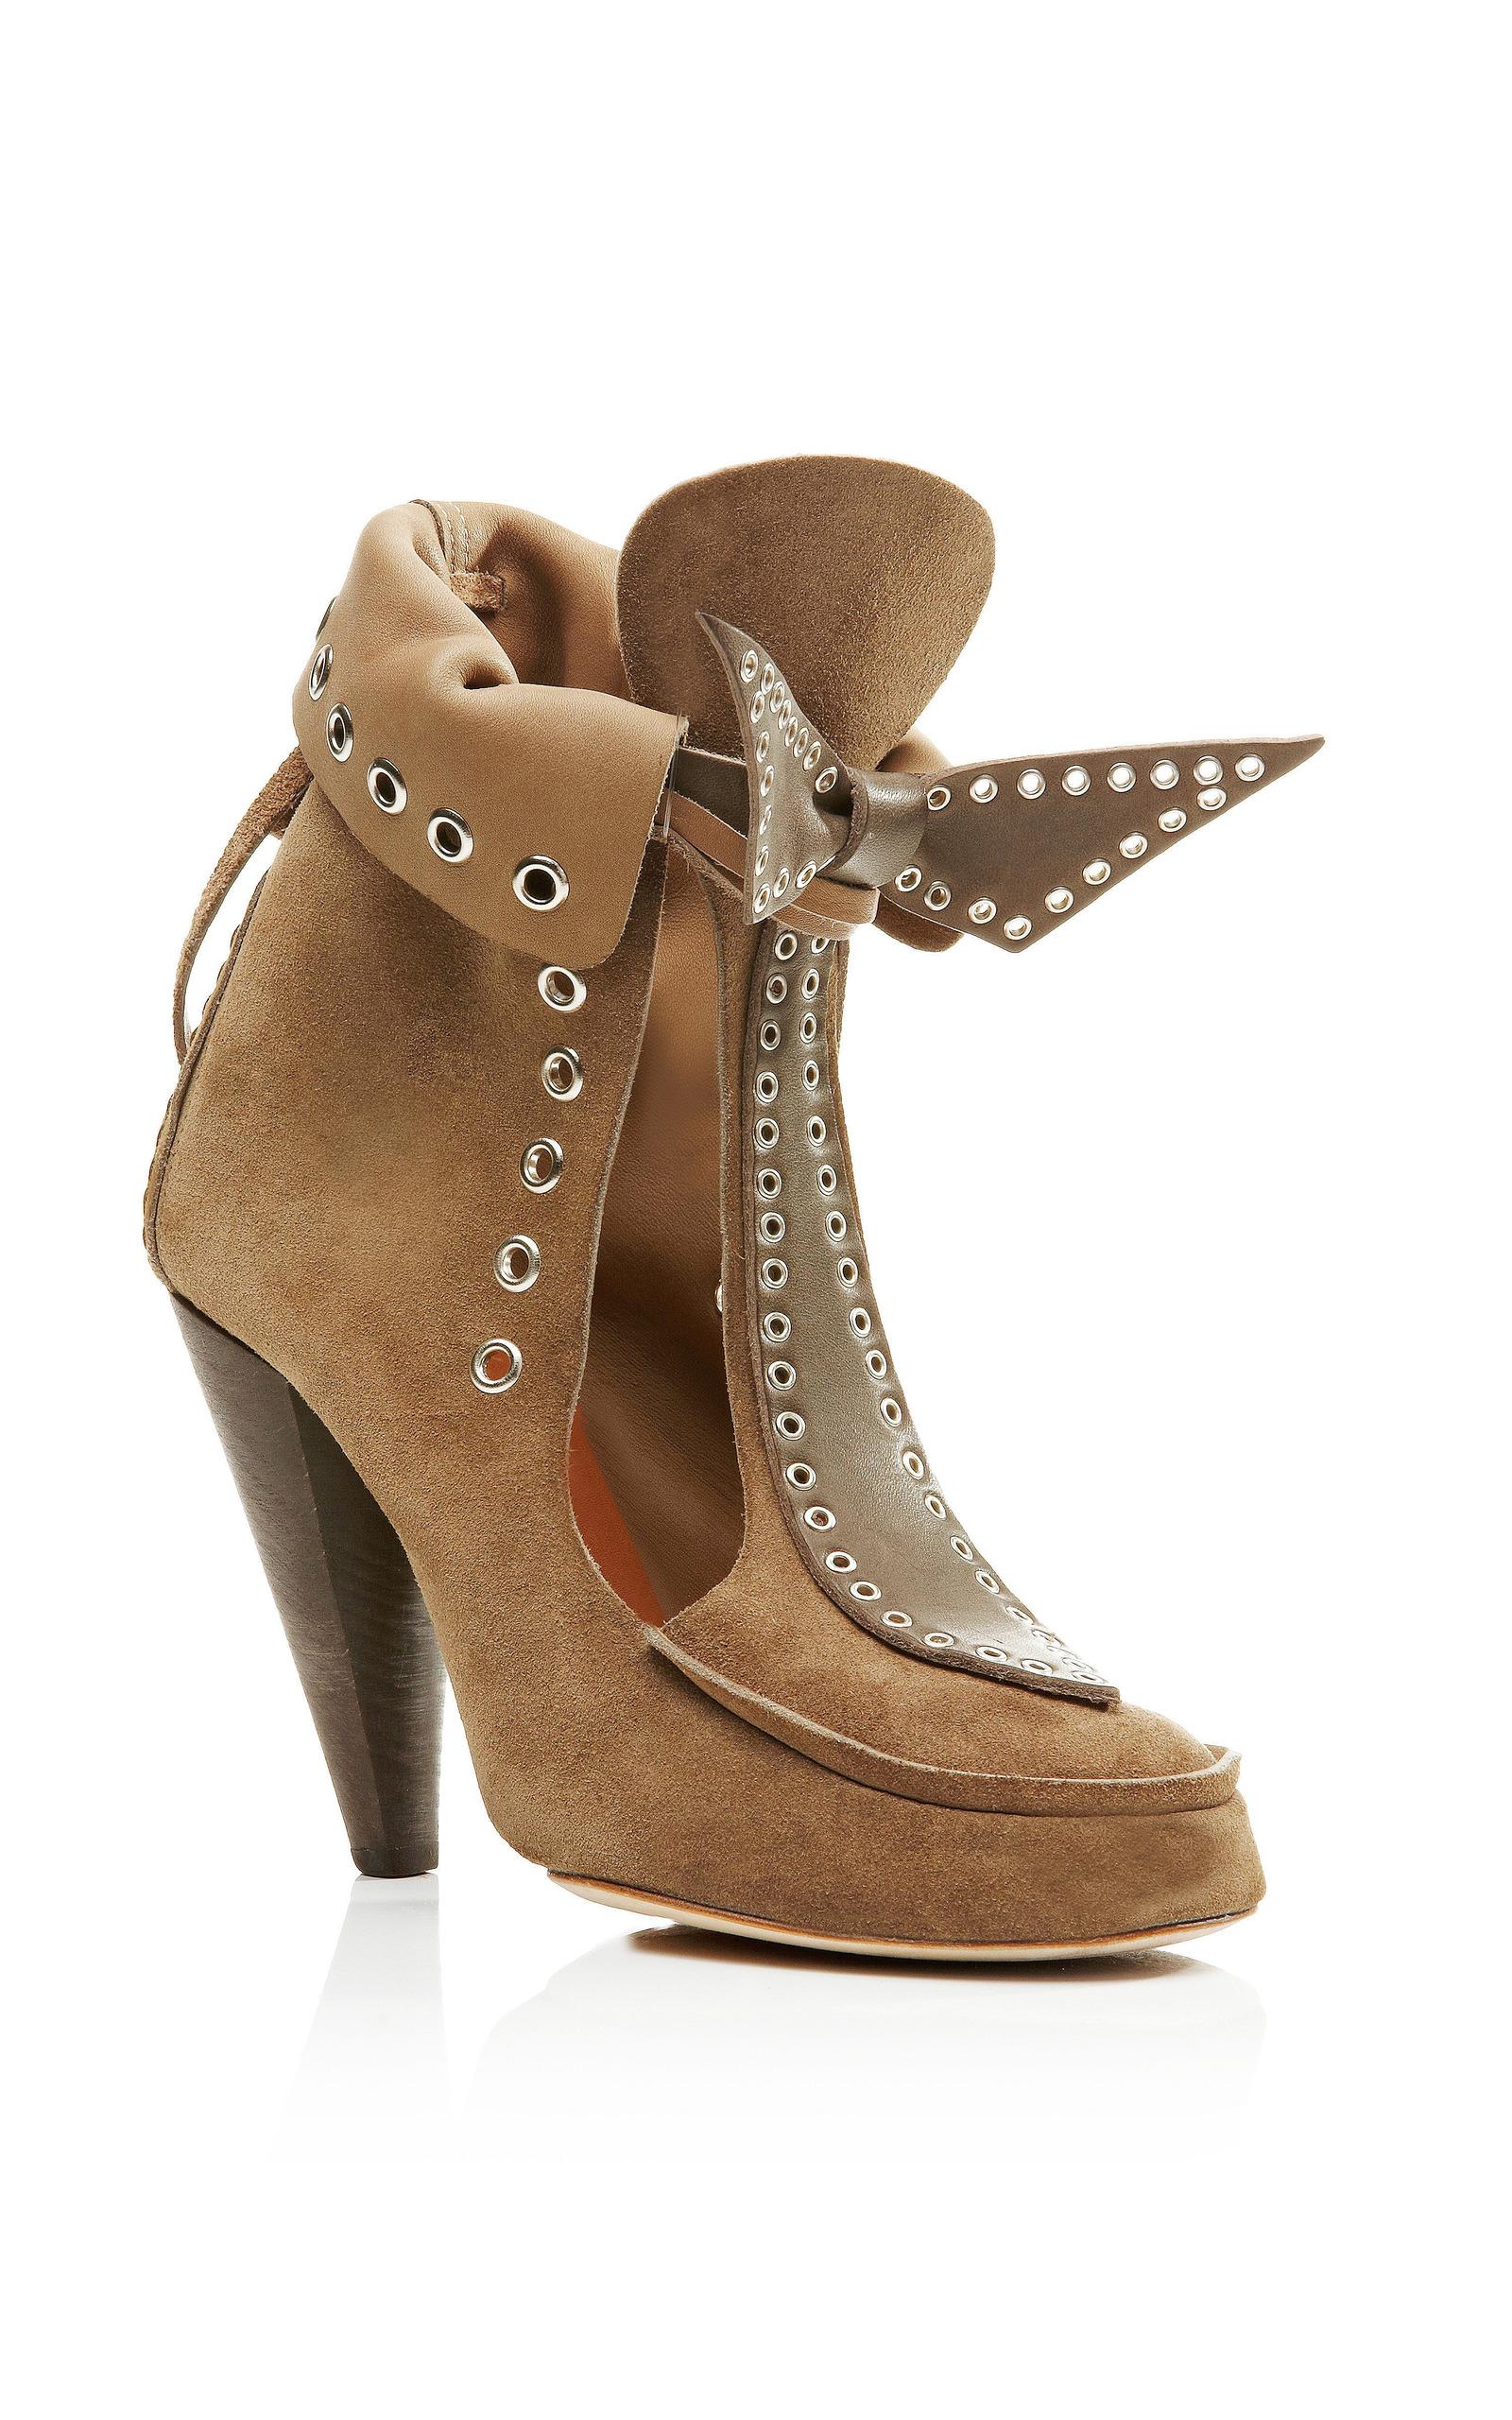 6aec5dc7f1e Isabel MarantMilla Bow Tie Loafer Heel. CLOSE. Loading